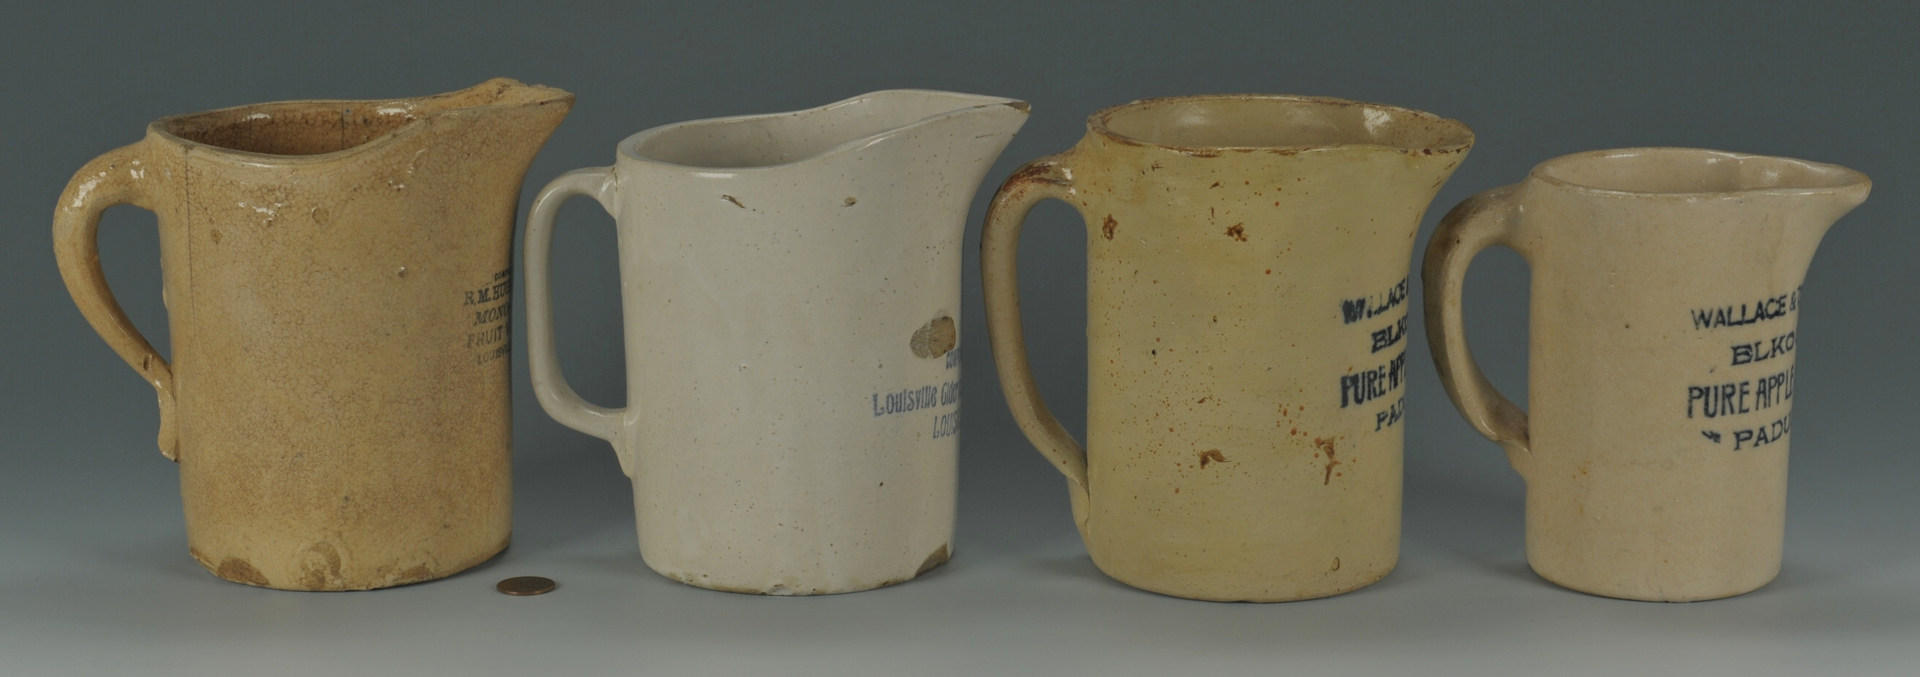 Lot 294: Four Kentucky Pottery Vinegar Pitchers